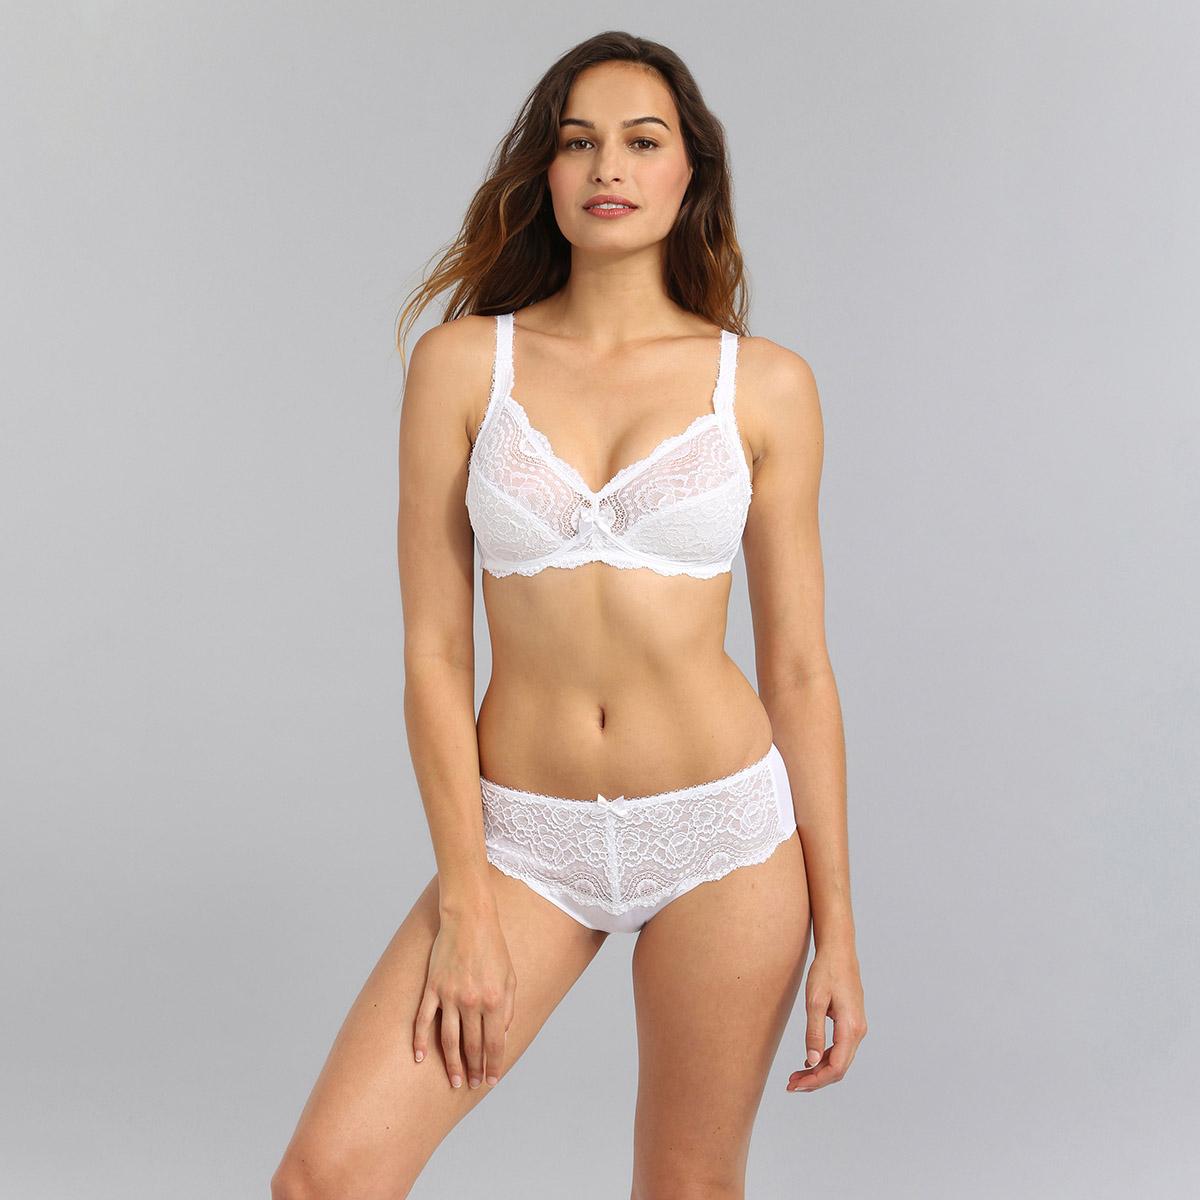 Soutien-gorge sans armatures blanc Flower Elegance, , PLAYTEX